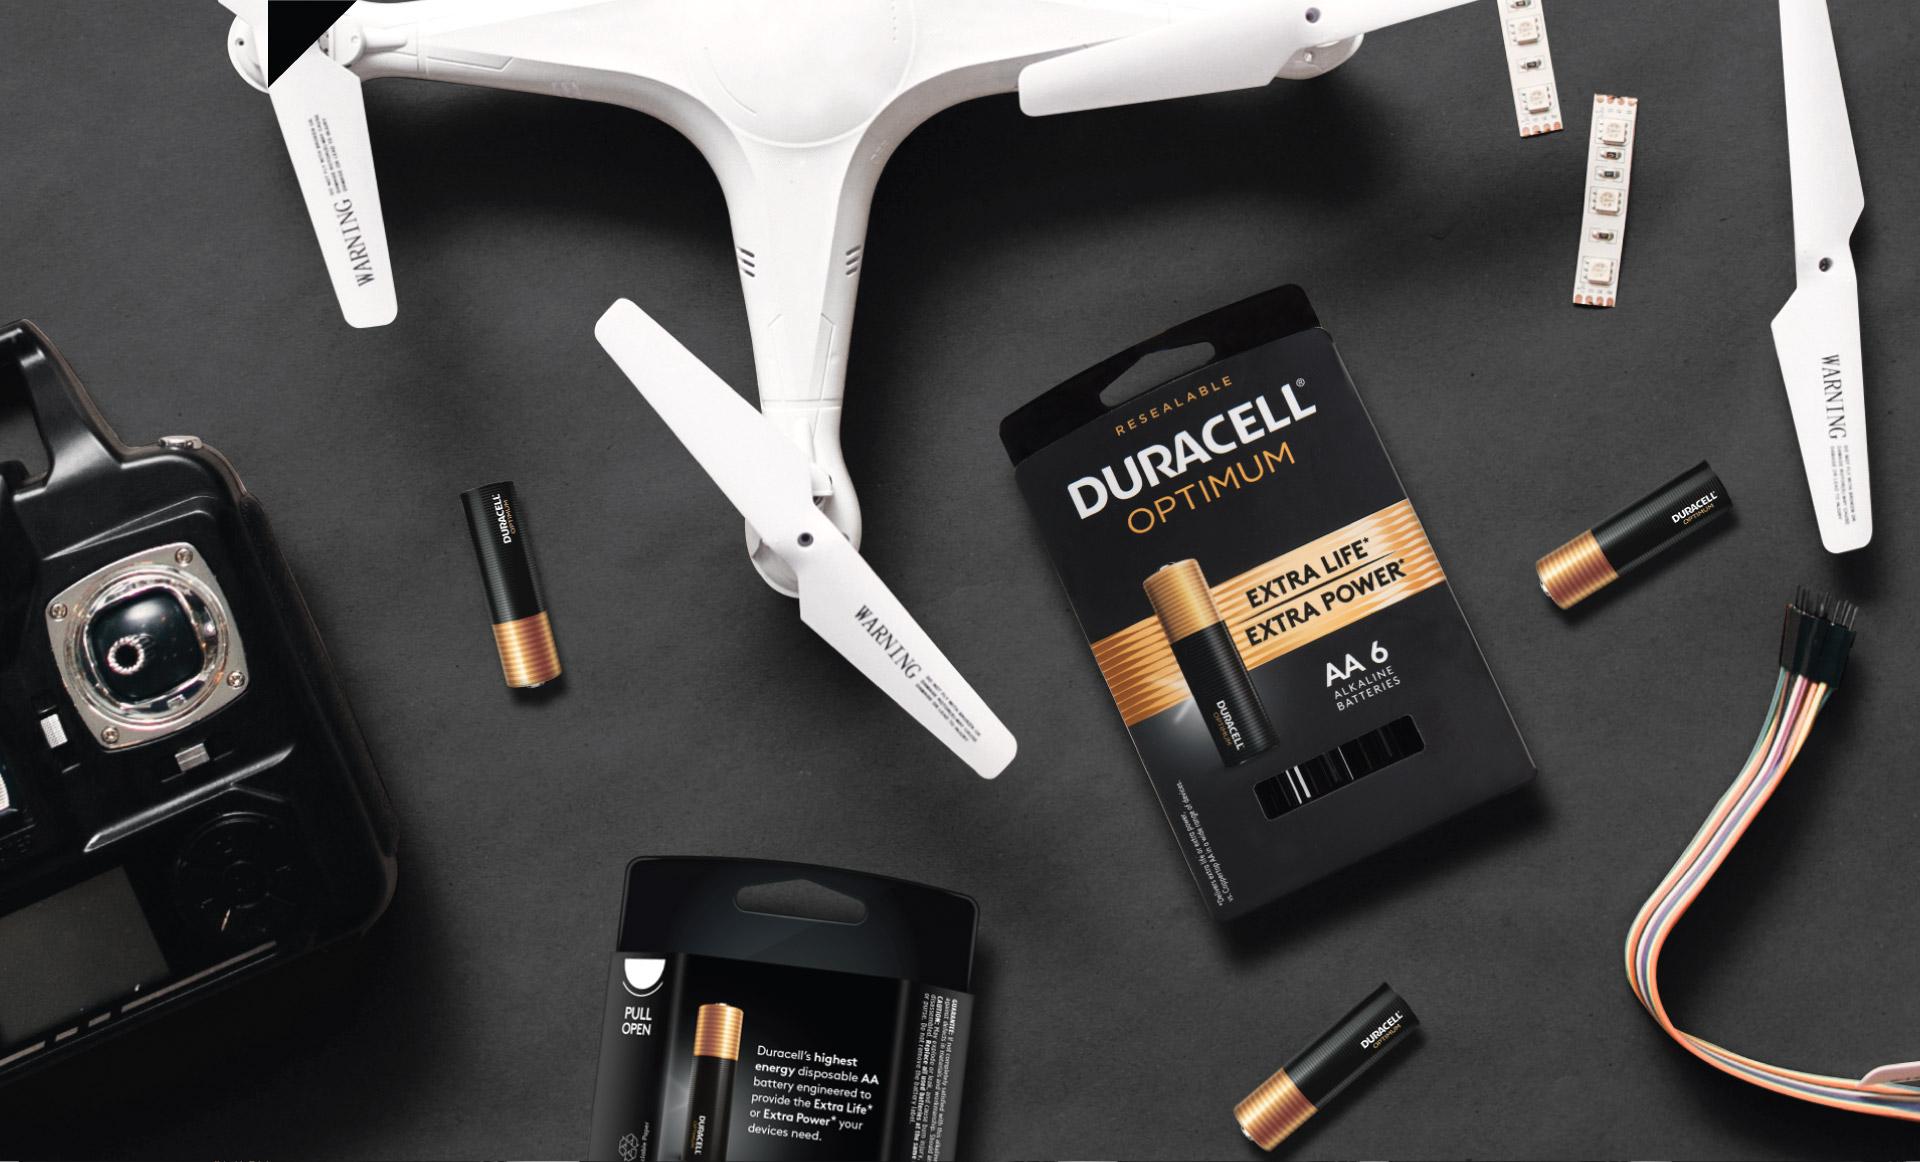 Duracell Optimum  - In Use